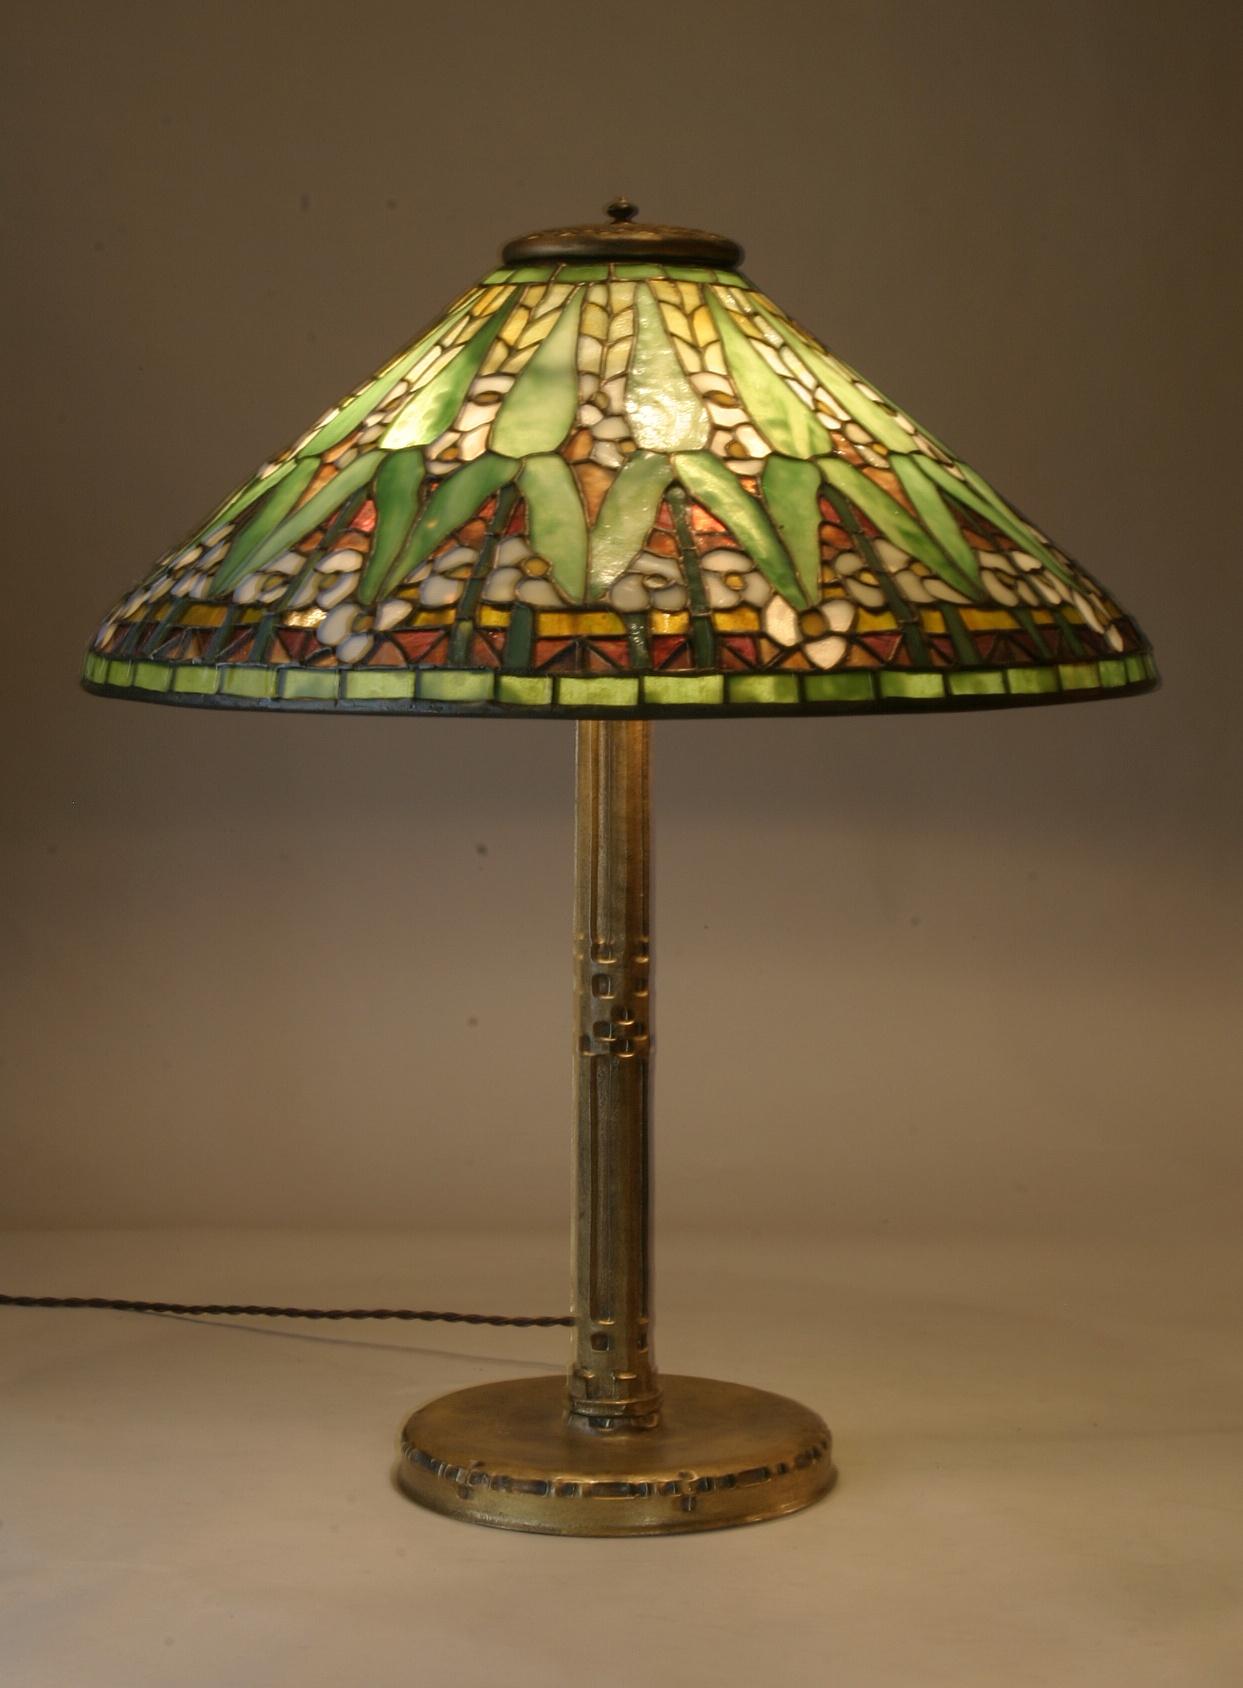 vintage-tiffany-lamps-photo-8